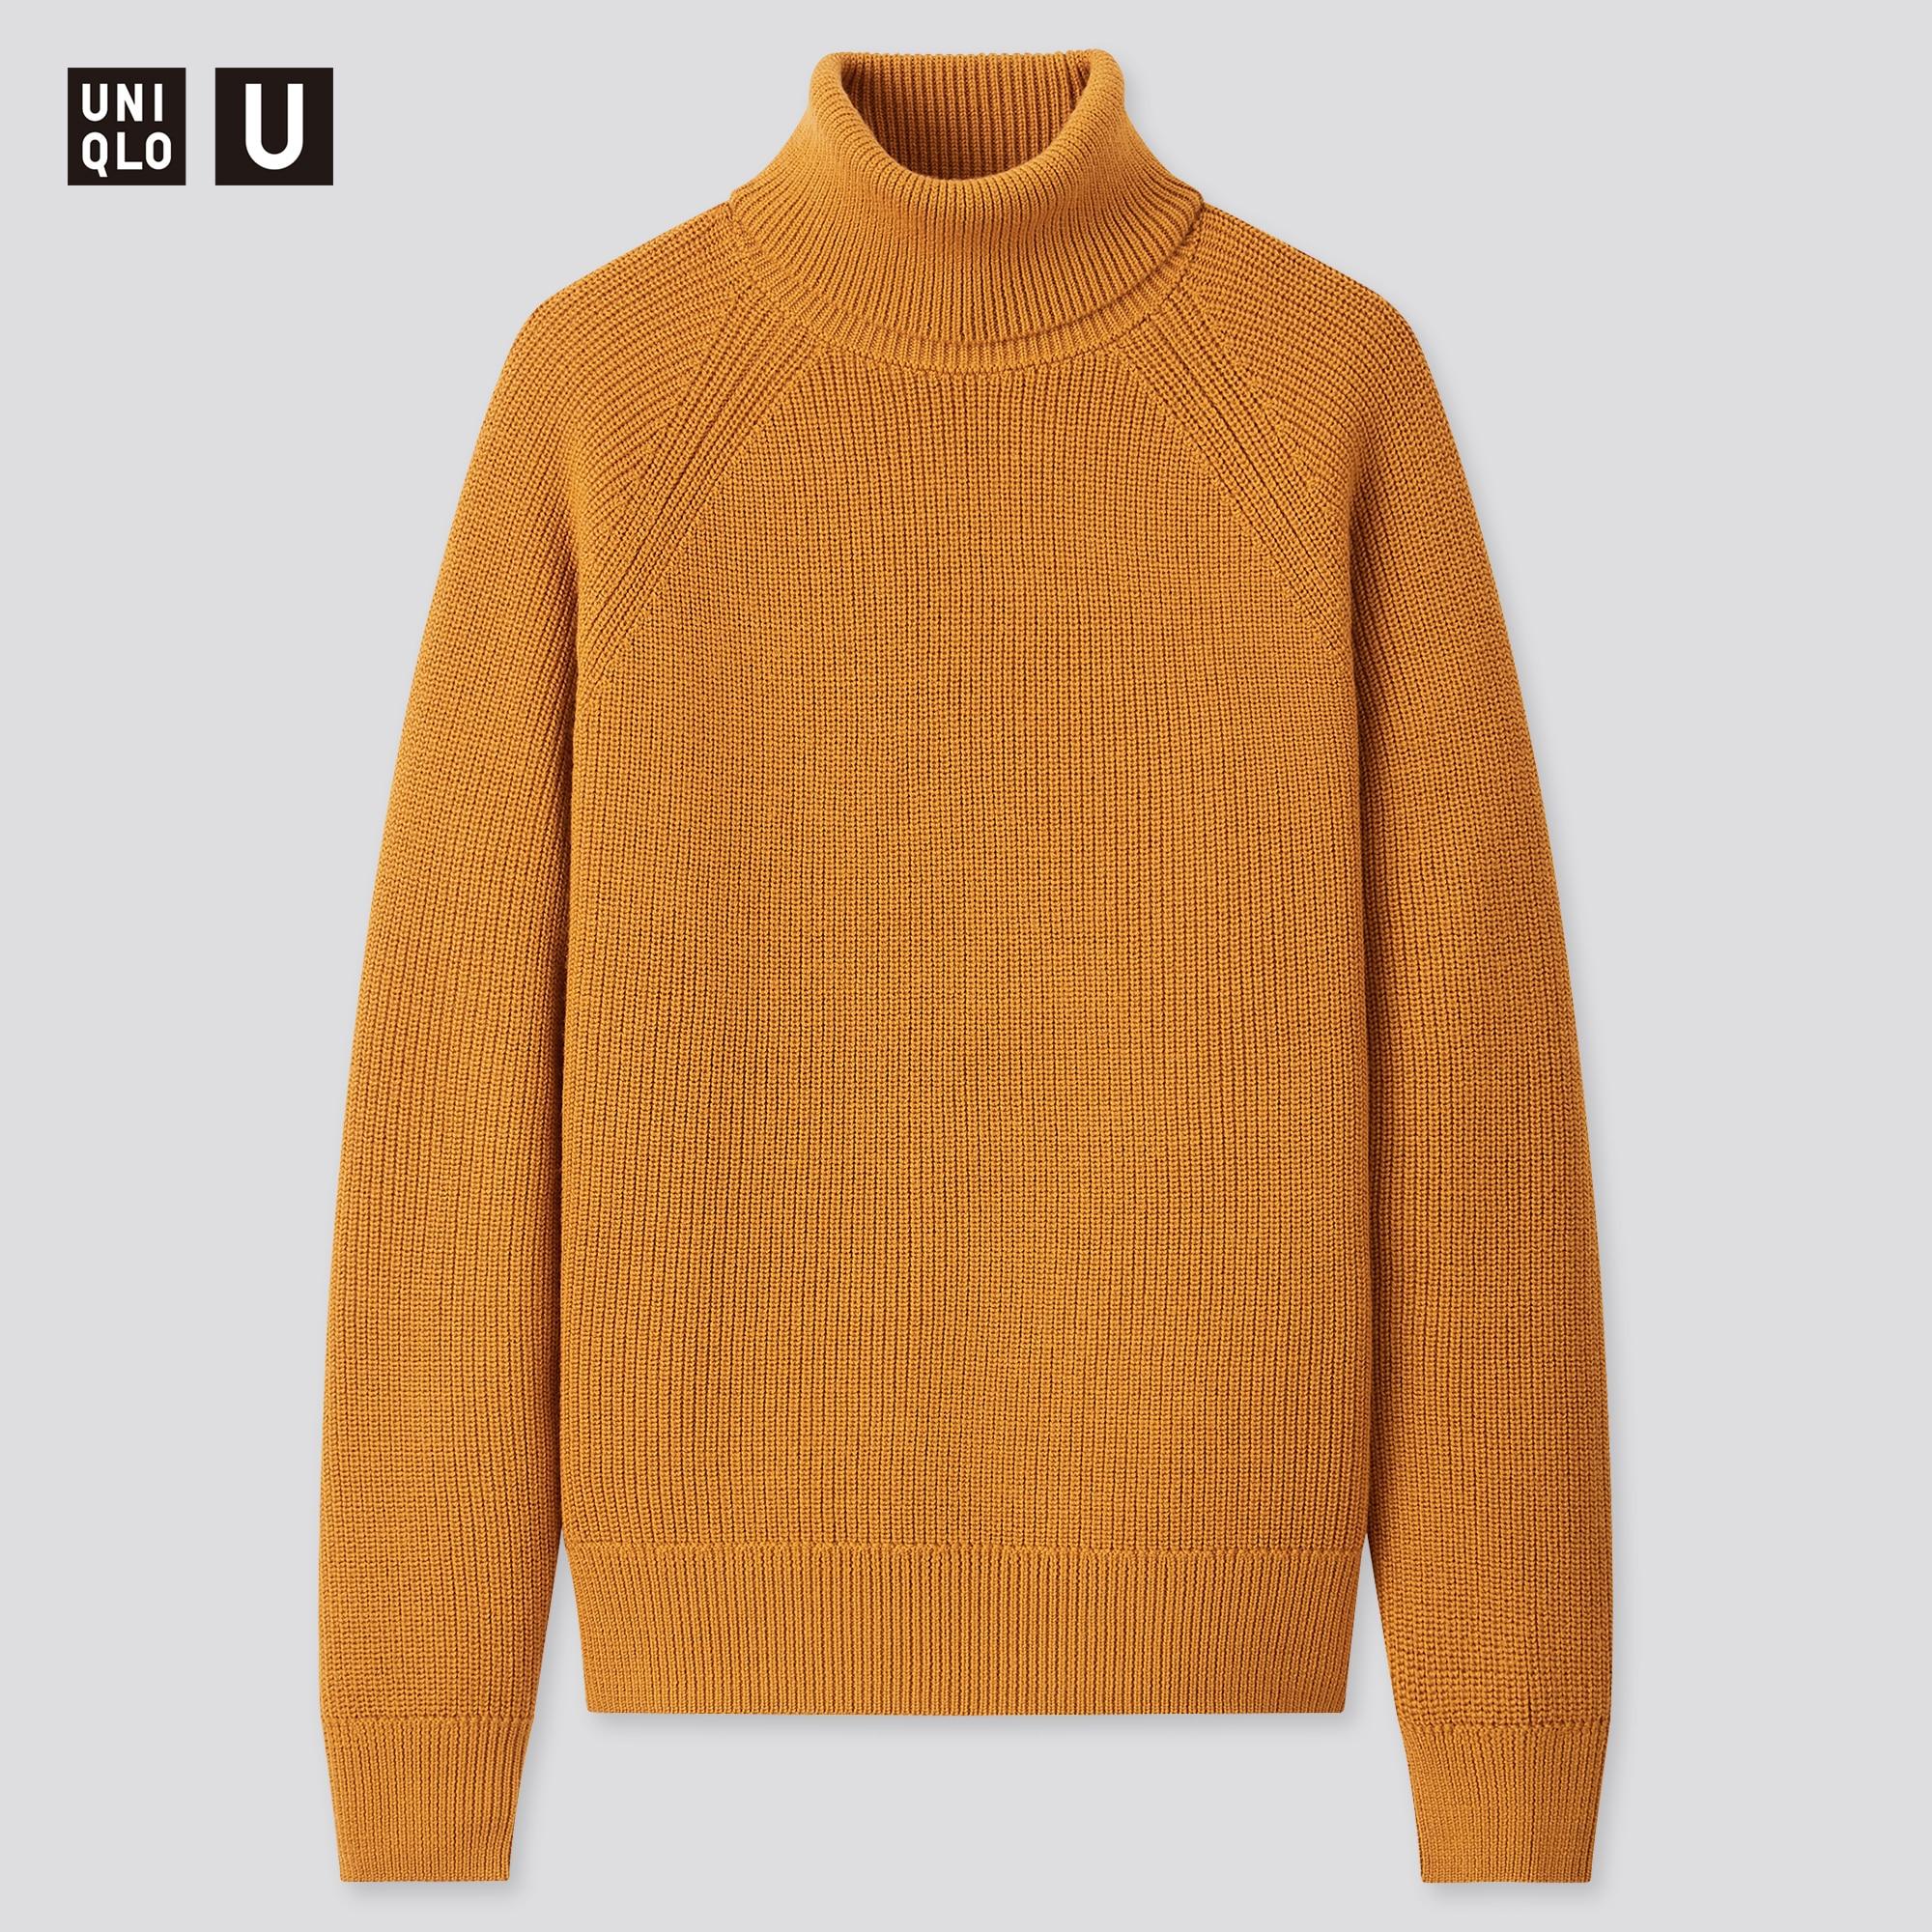 men u fisherman ribbed turtleneck long-sleeve sweater